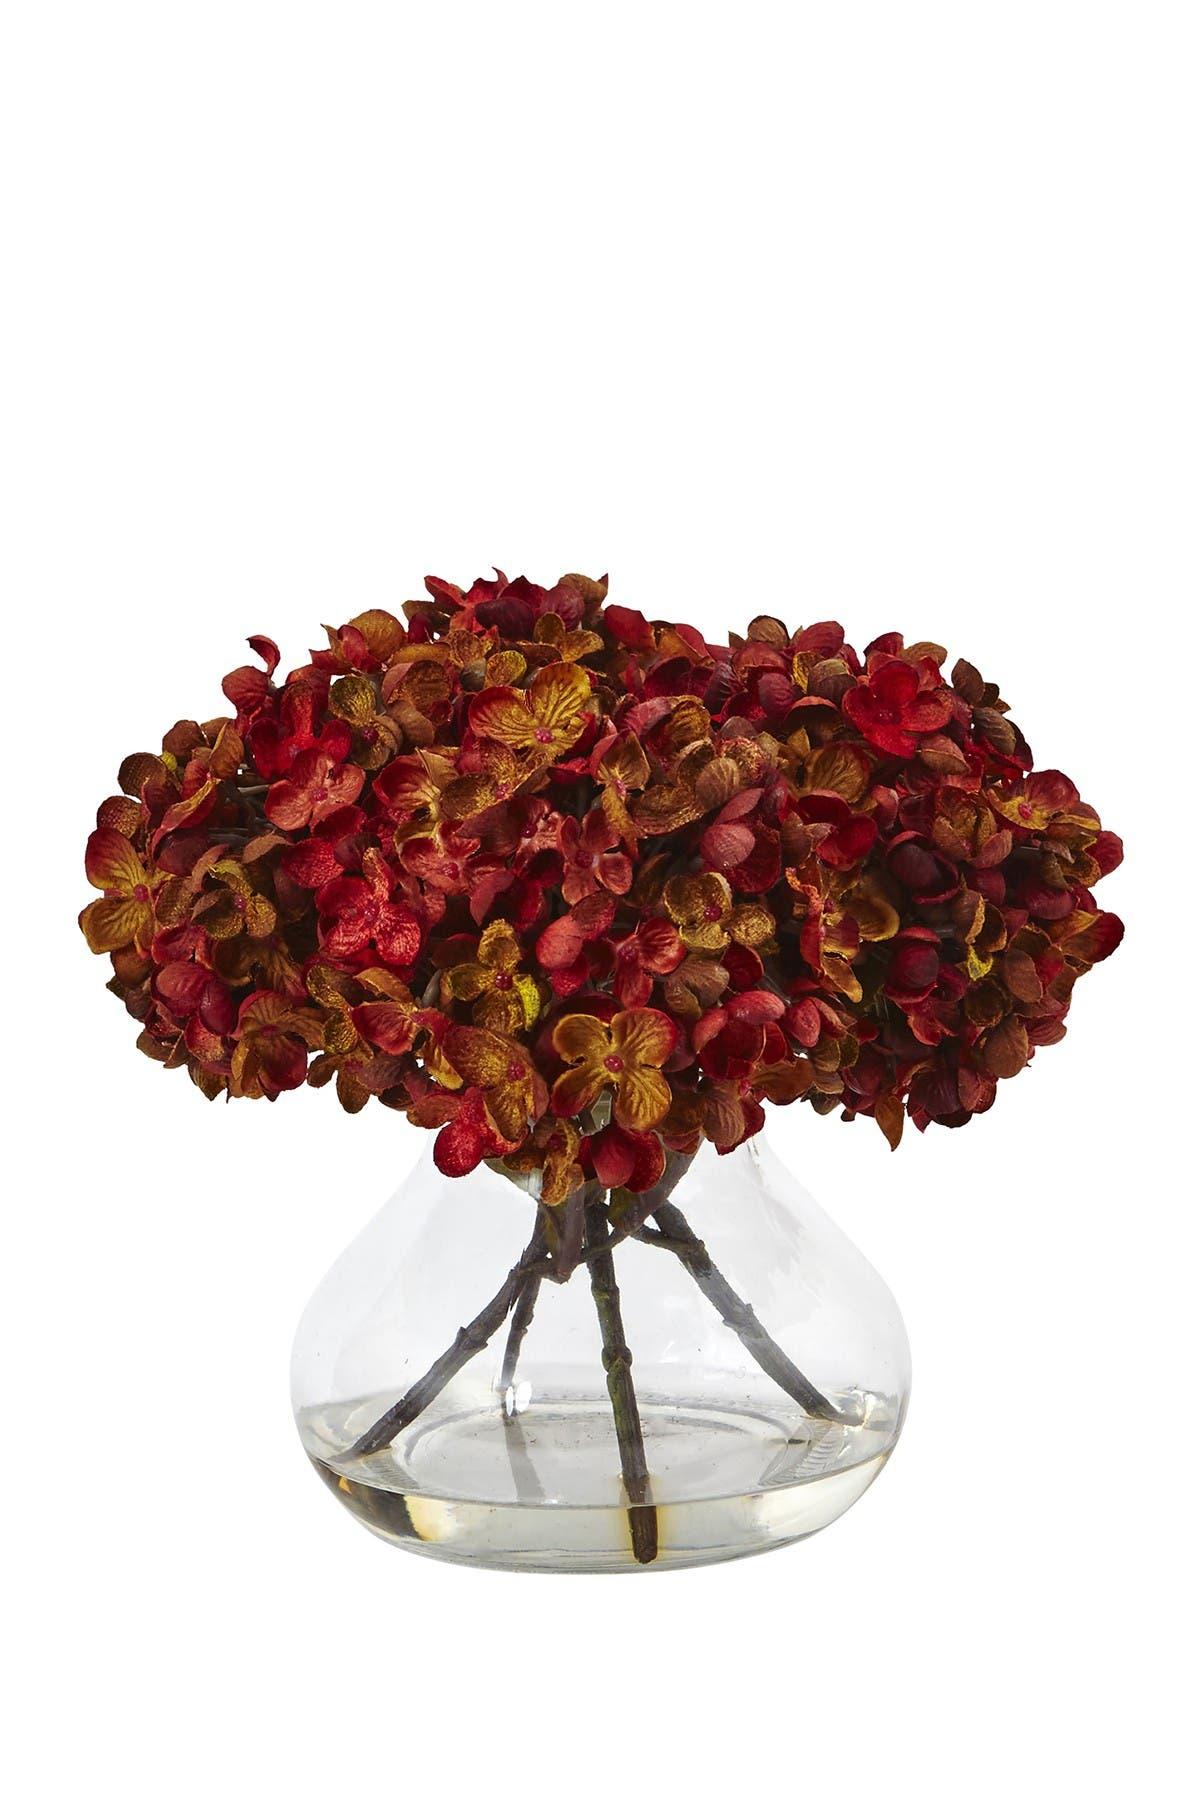 Nearly Natural Red 8 5 H Hydrangea Silk Flower Arrangement With Glass Vase Nordstrom Rack